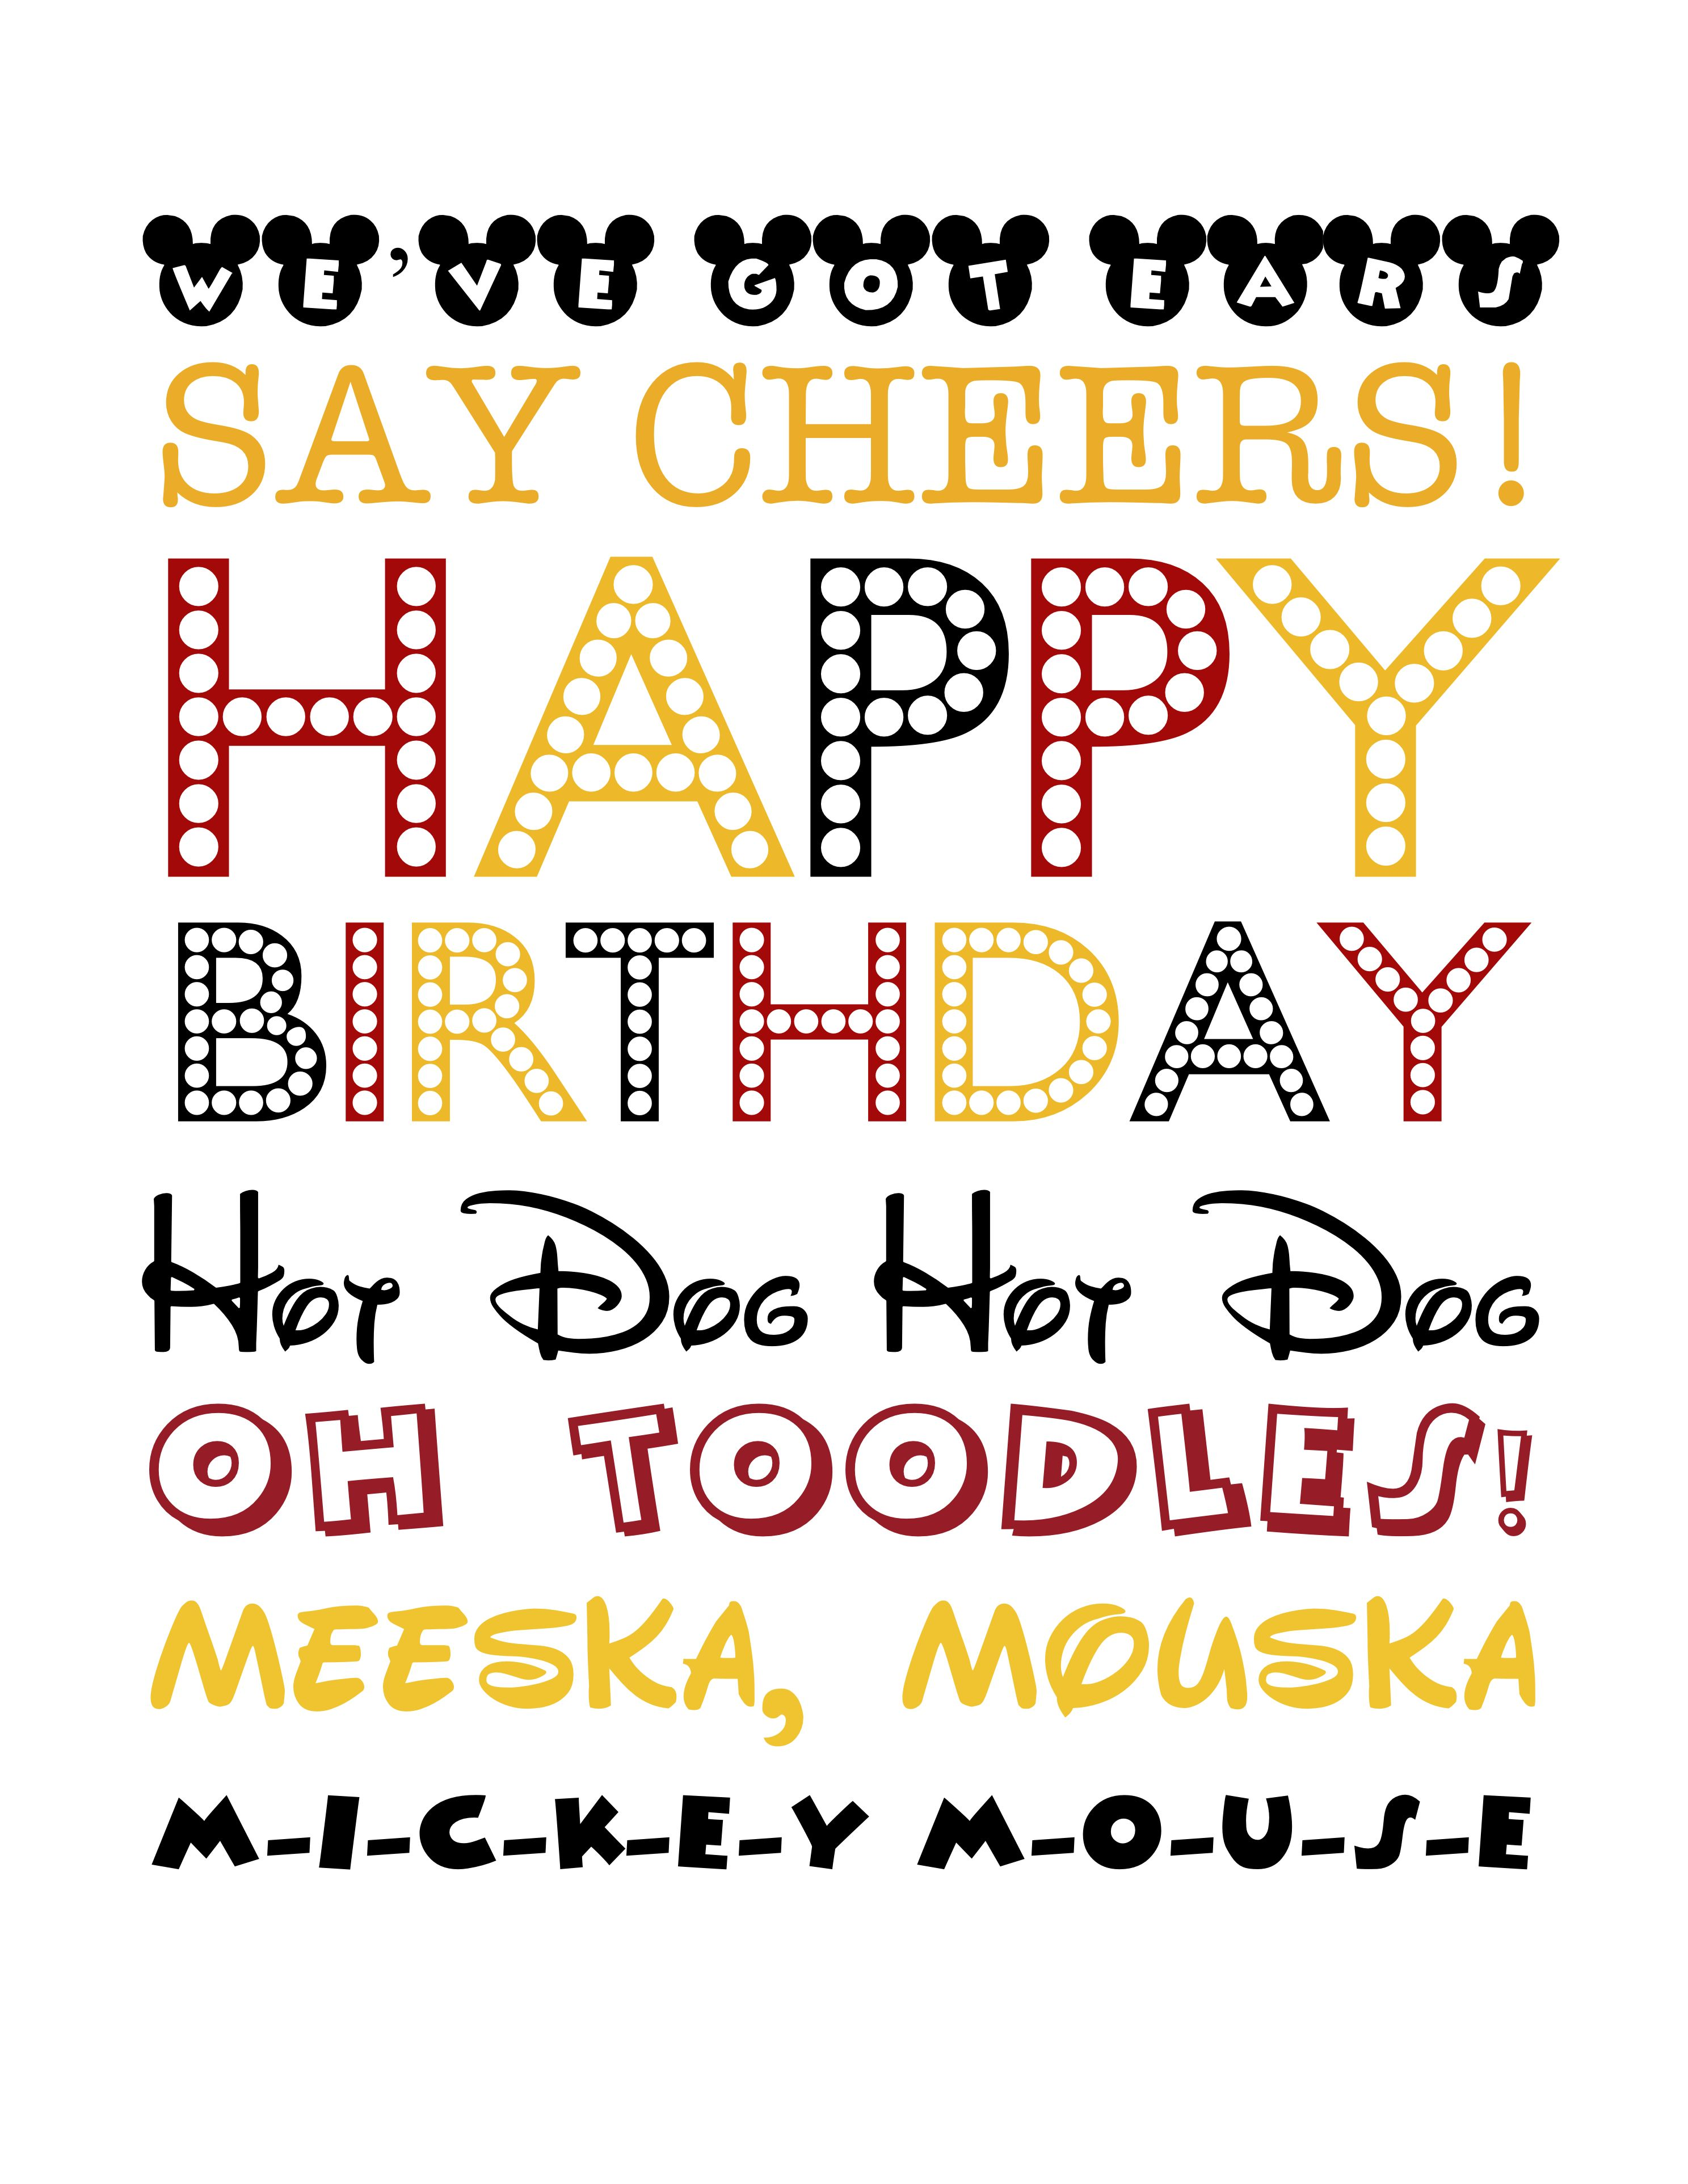 Mickymaus Geburtstag, Mickey Party, Minnie Mouse, Micky Maus Wunderhaus,  Geburtstag U Bahn Kunst, Geburtstagsfeierideen, 2. Geburtstag, Mickey  Printables ...